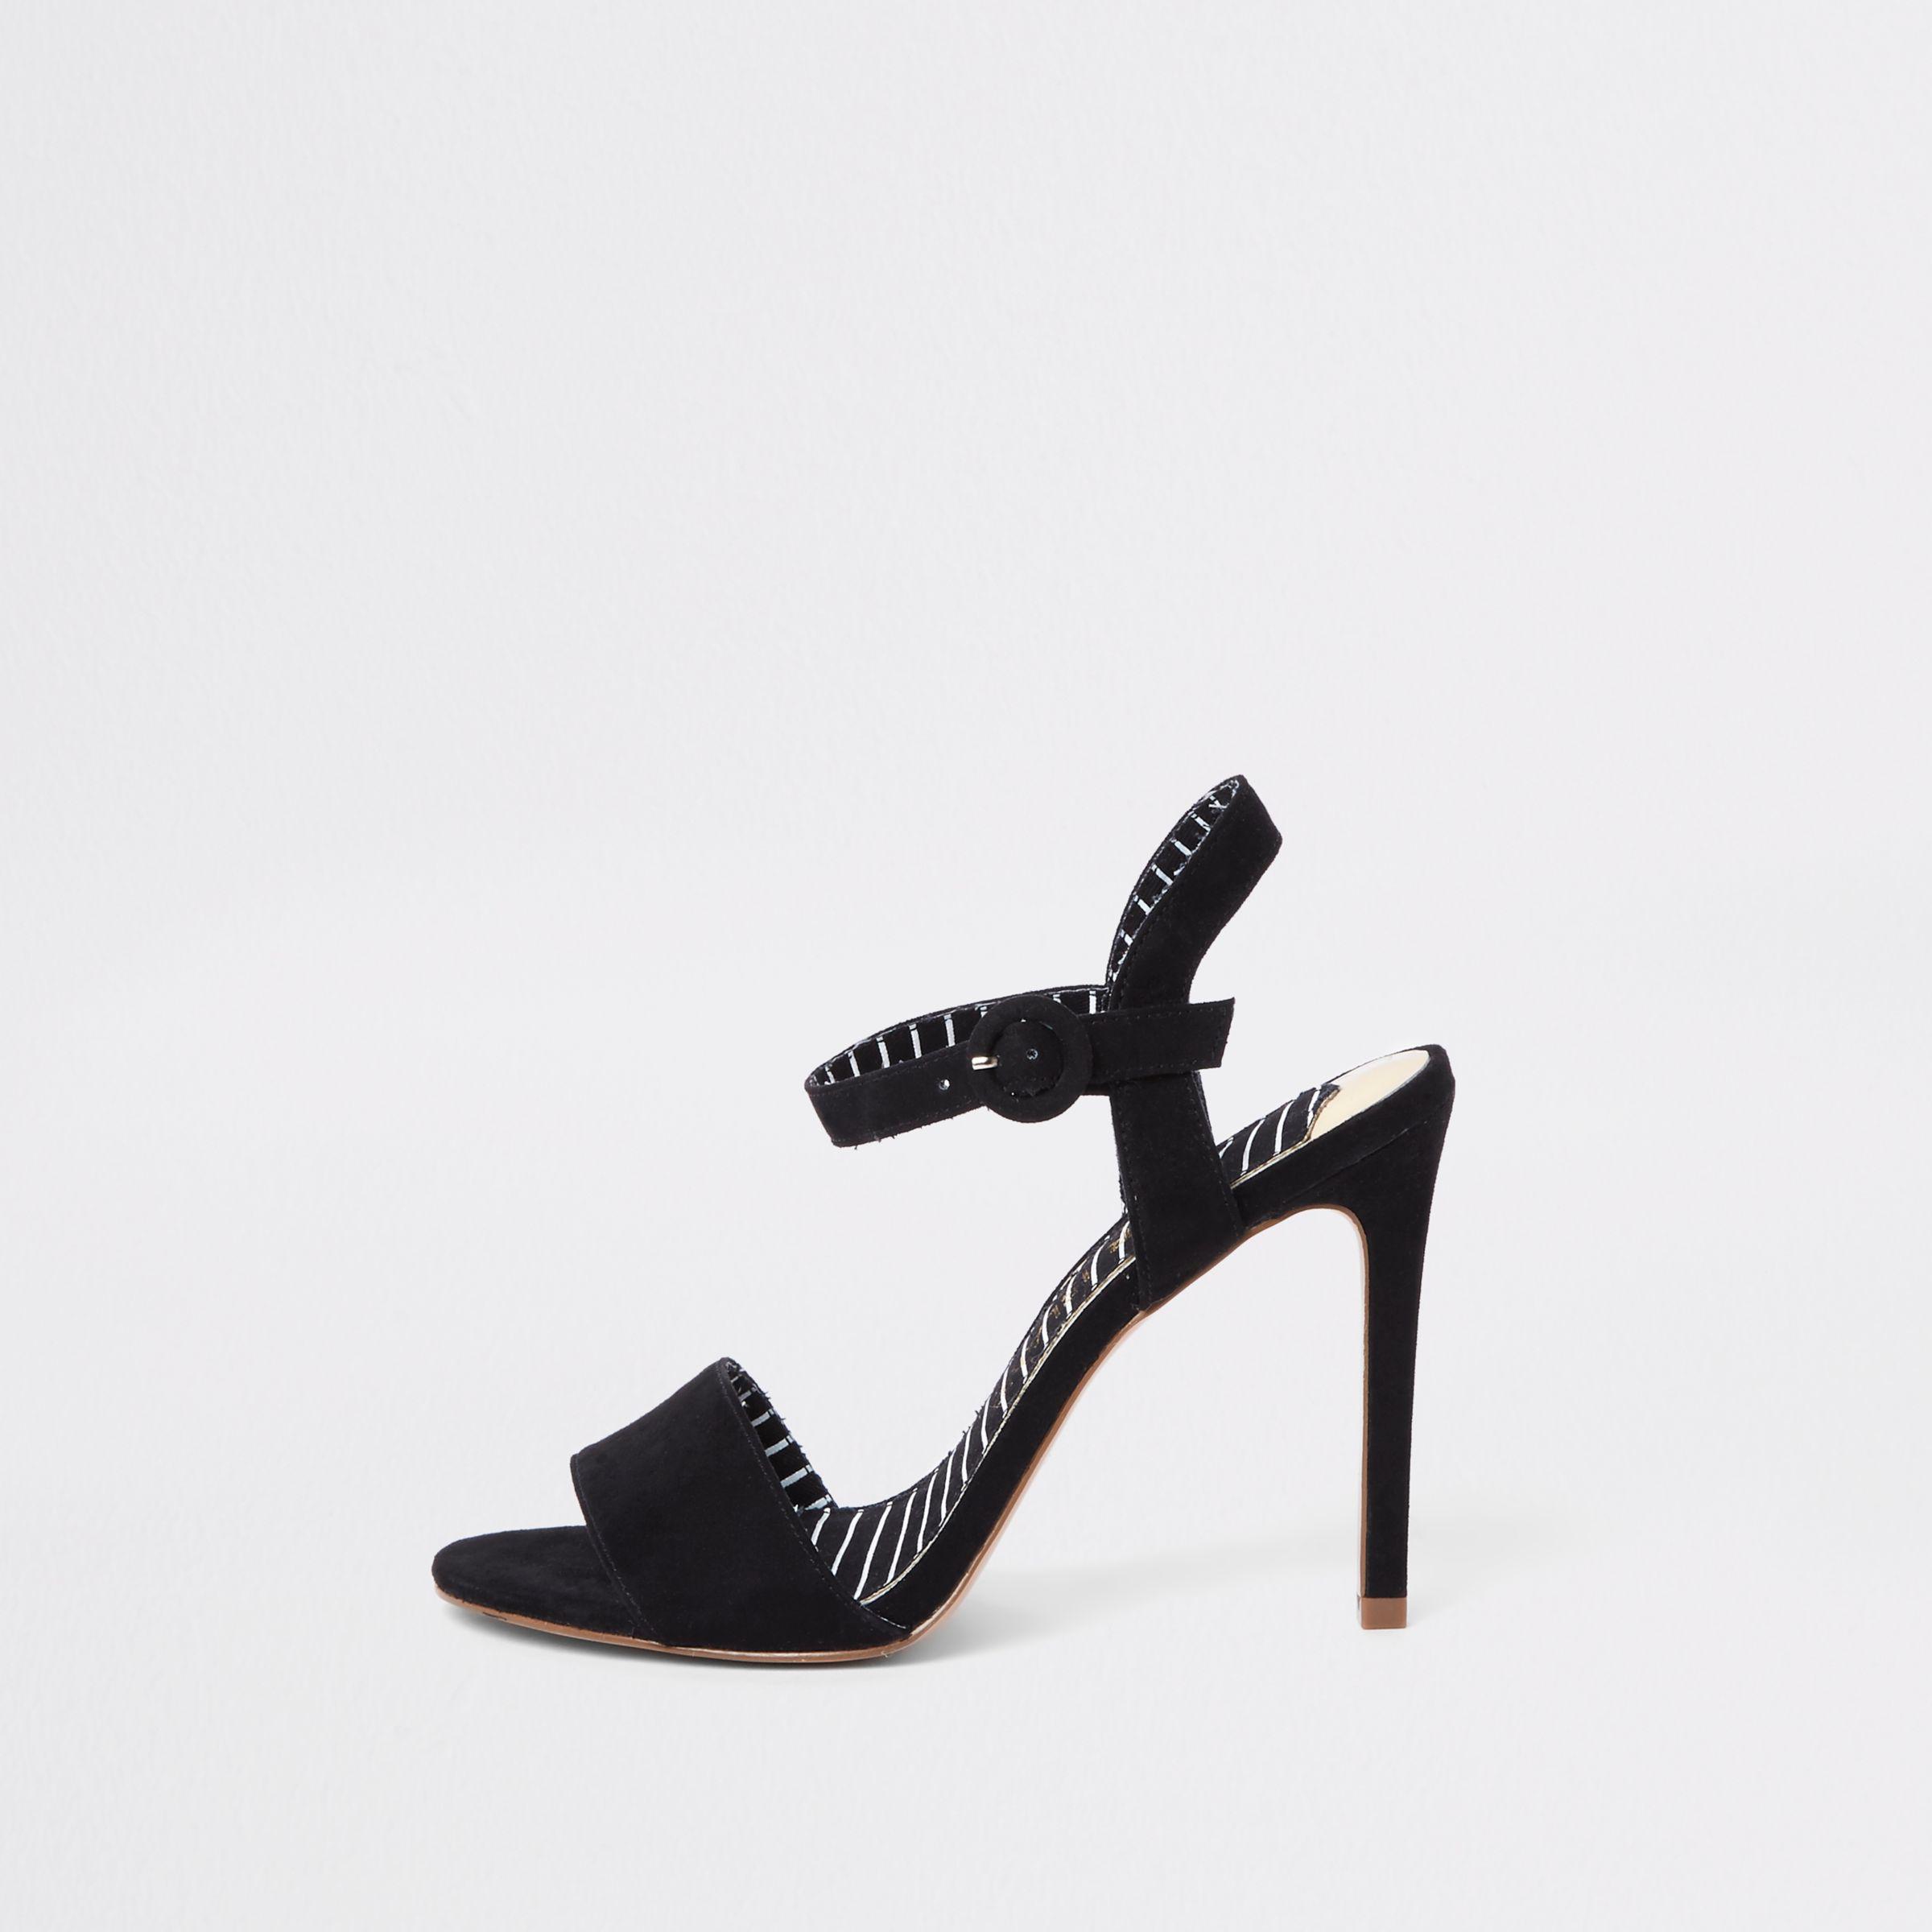 ec8db2fb42 River Island Black Wide Fit Two Part Stiletto Heel Sandals in Black ...